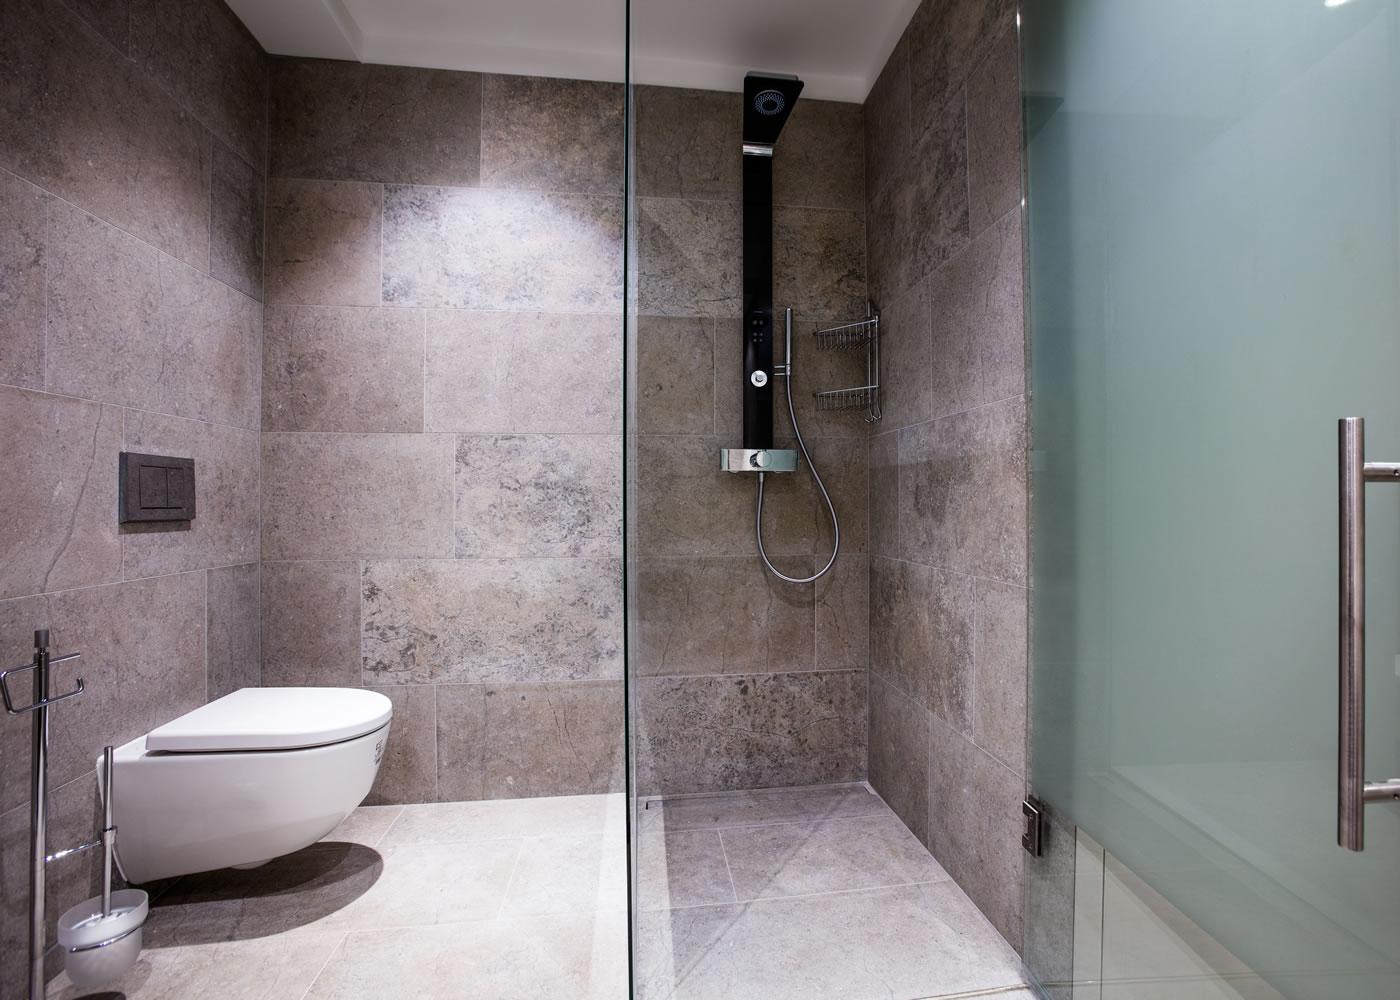 wetroom-installations